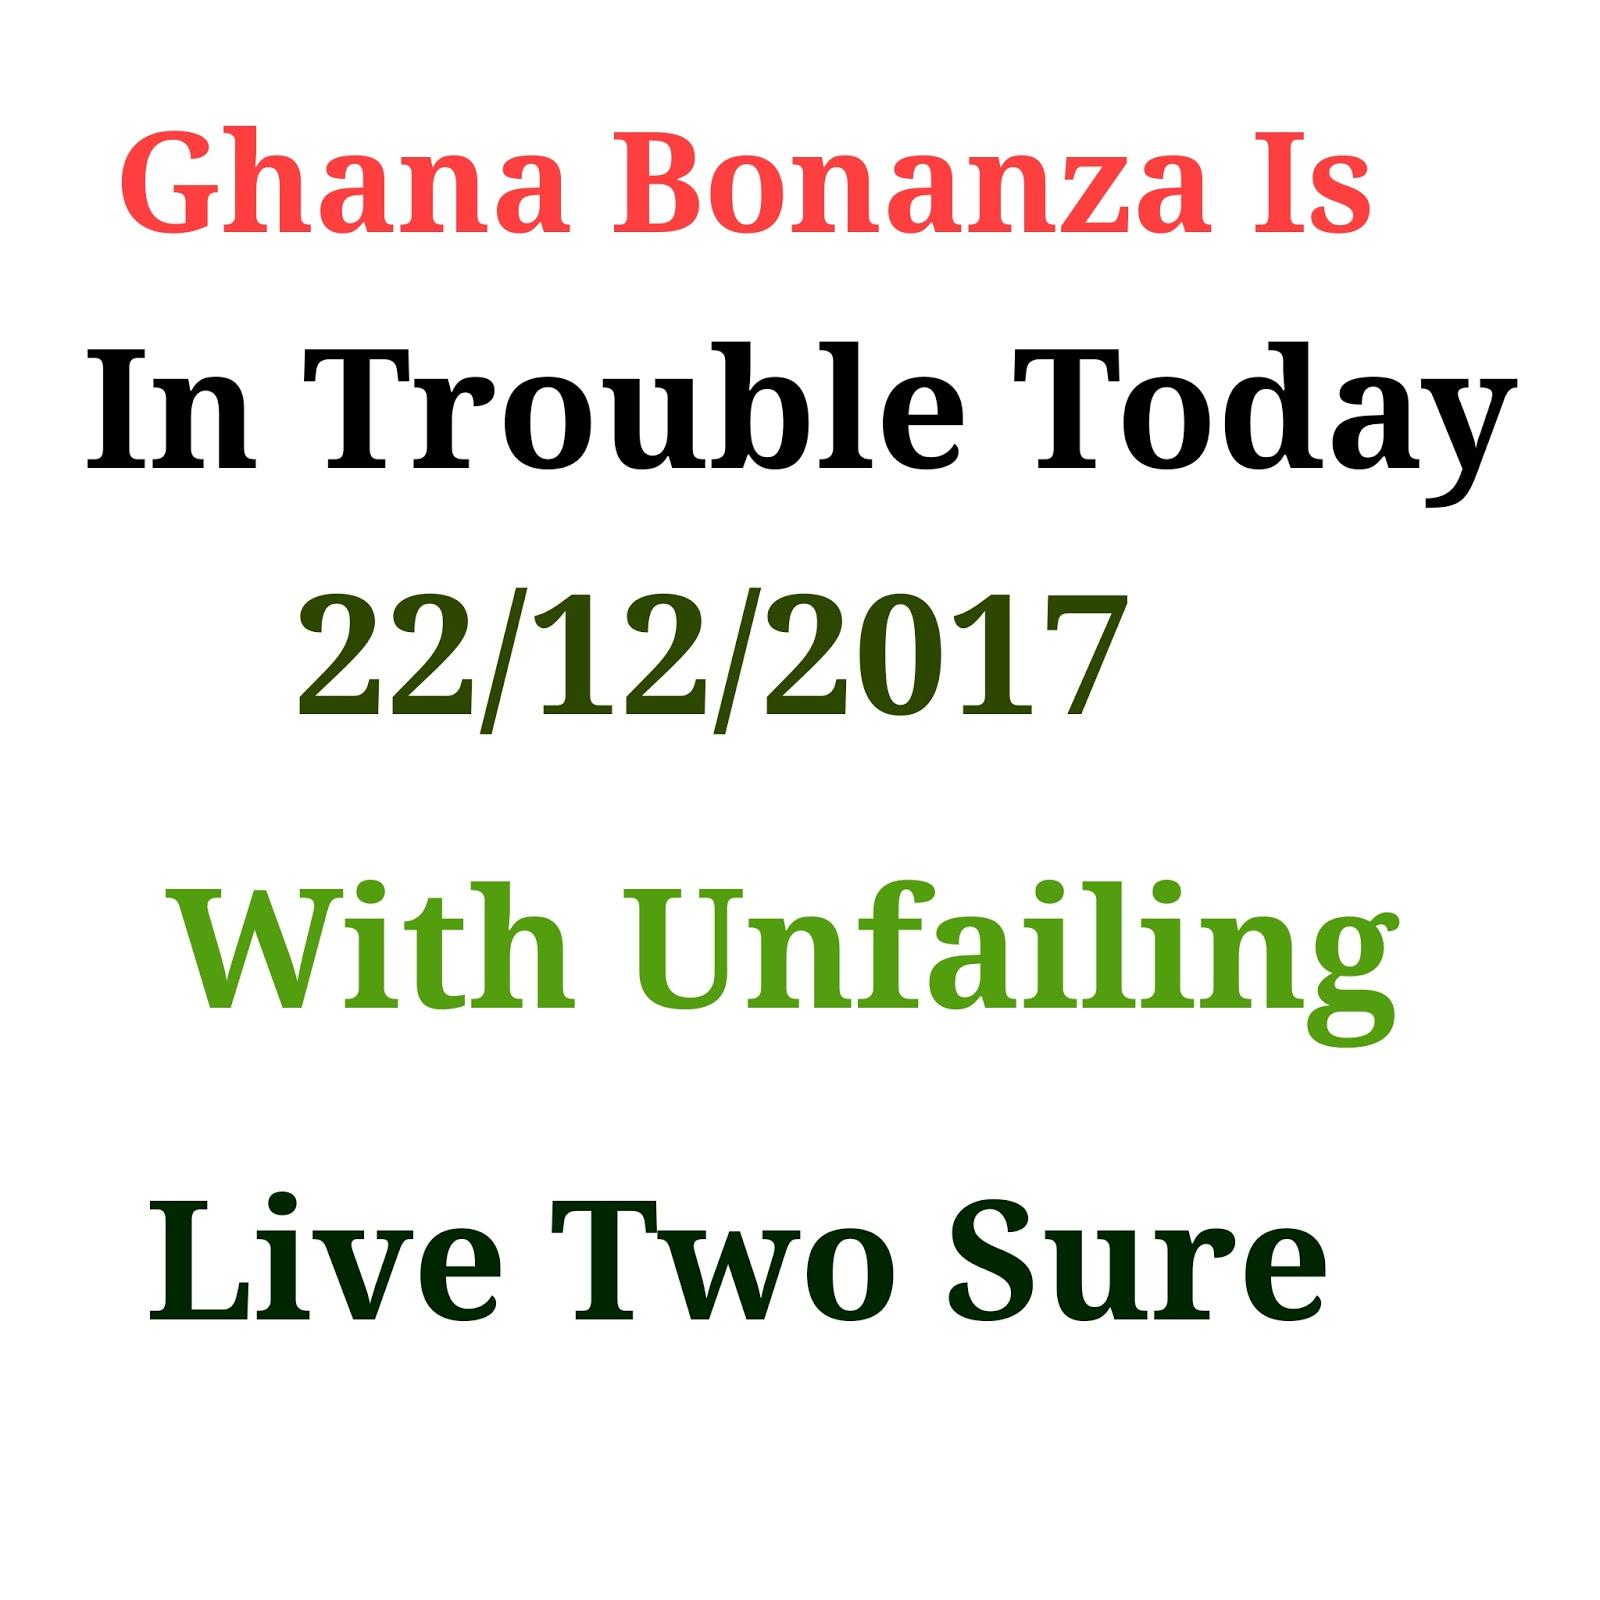 Baba Ijebu Lottery Bonanza Game 22/12/2017 Is In Trouble